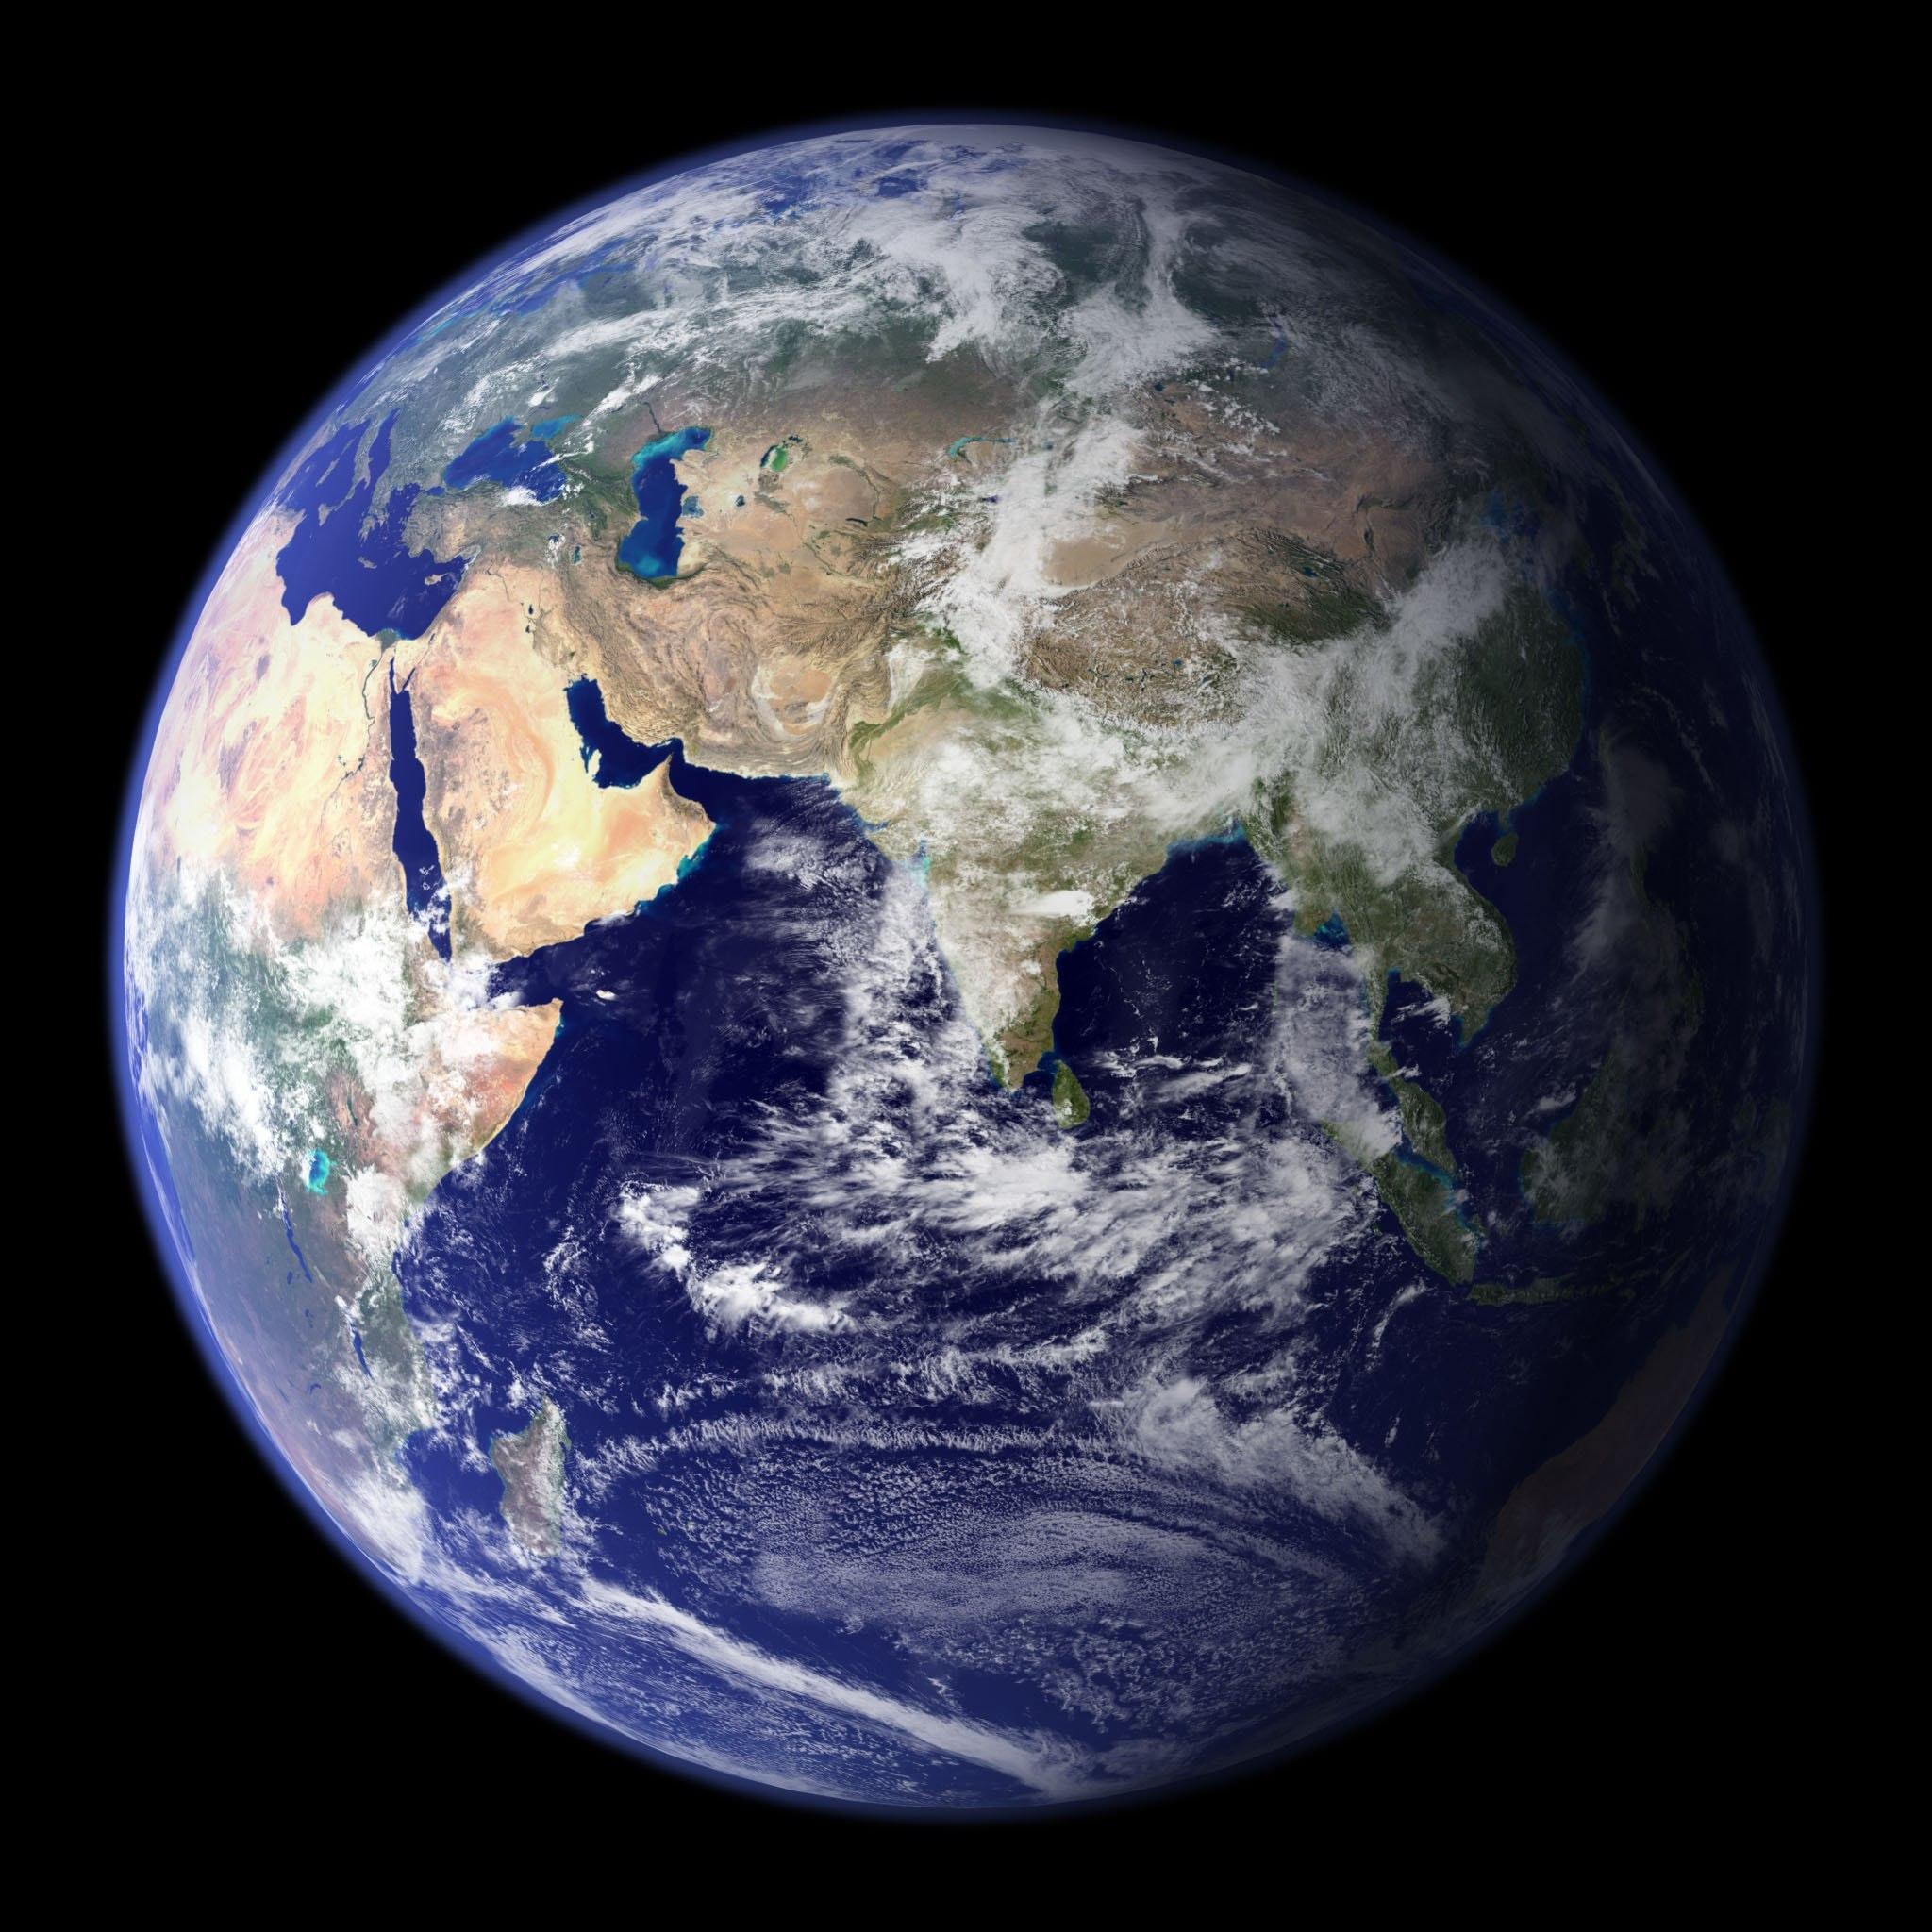 blue-planet-earth-globe-41953.jpg